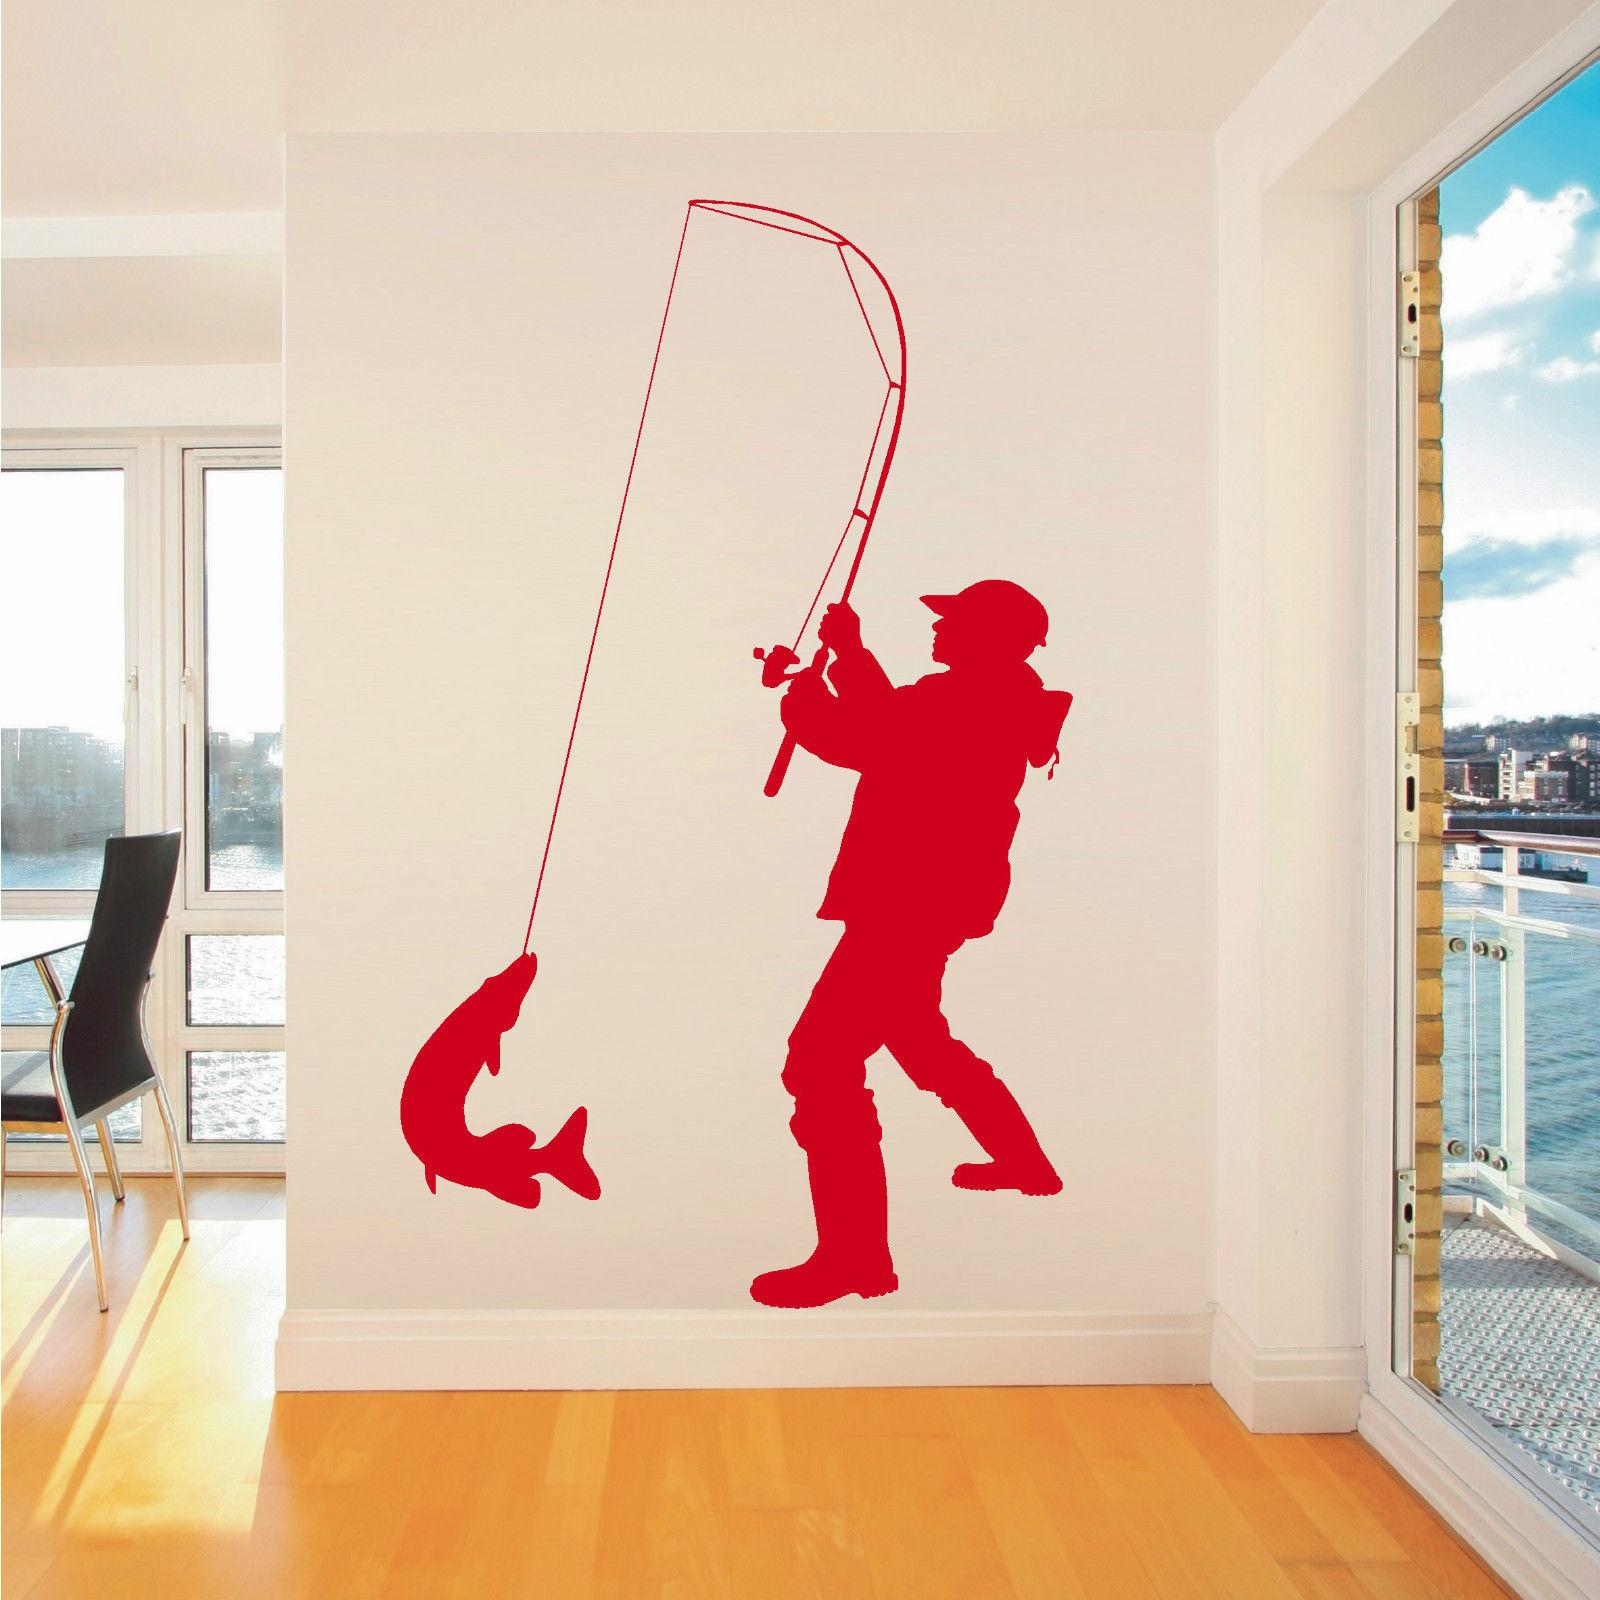 popular children room decals buy cheap children room decals lots zn g155 fisherman angler fishing vinyl wall art sticker decal children room wall stickers art living